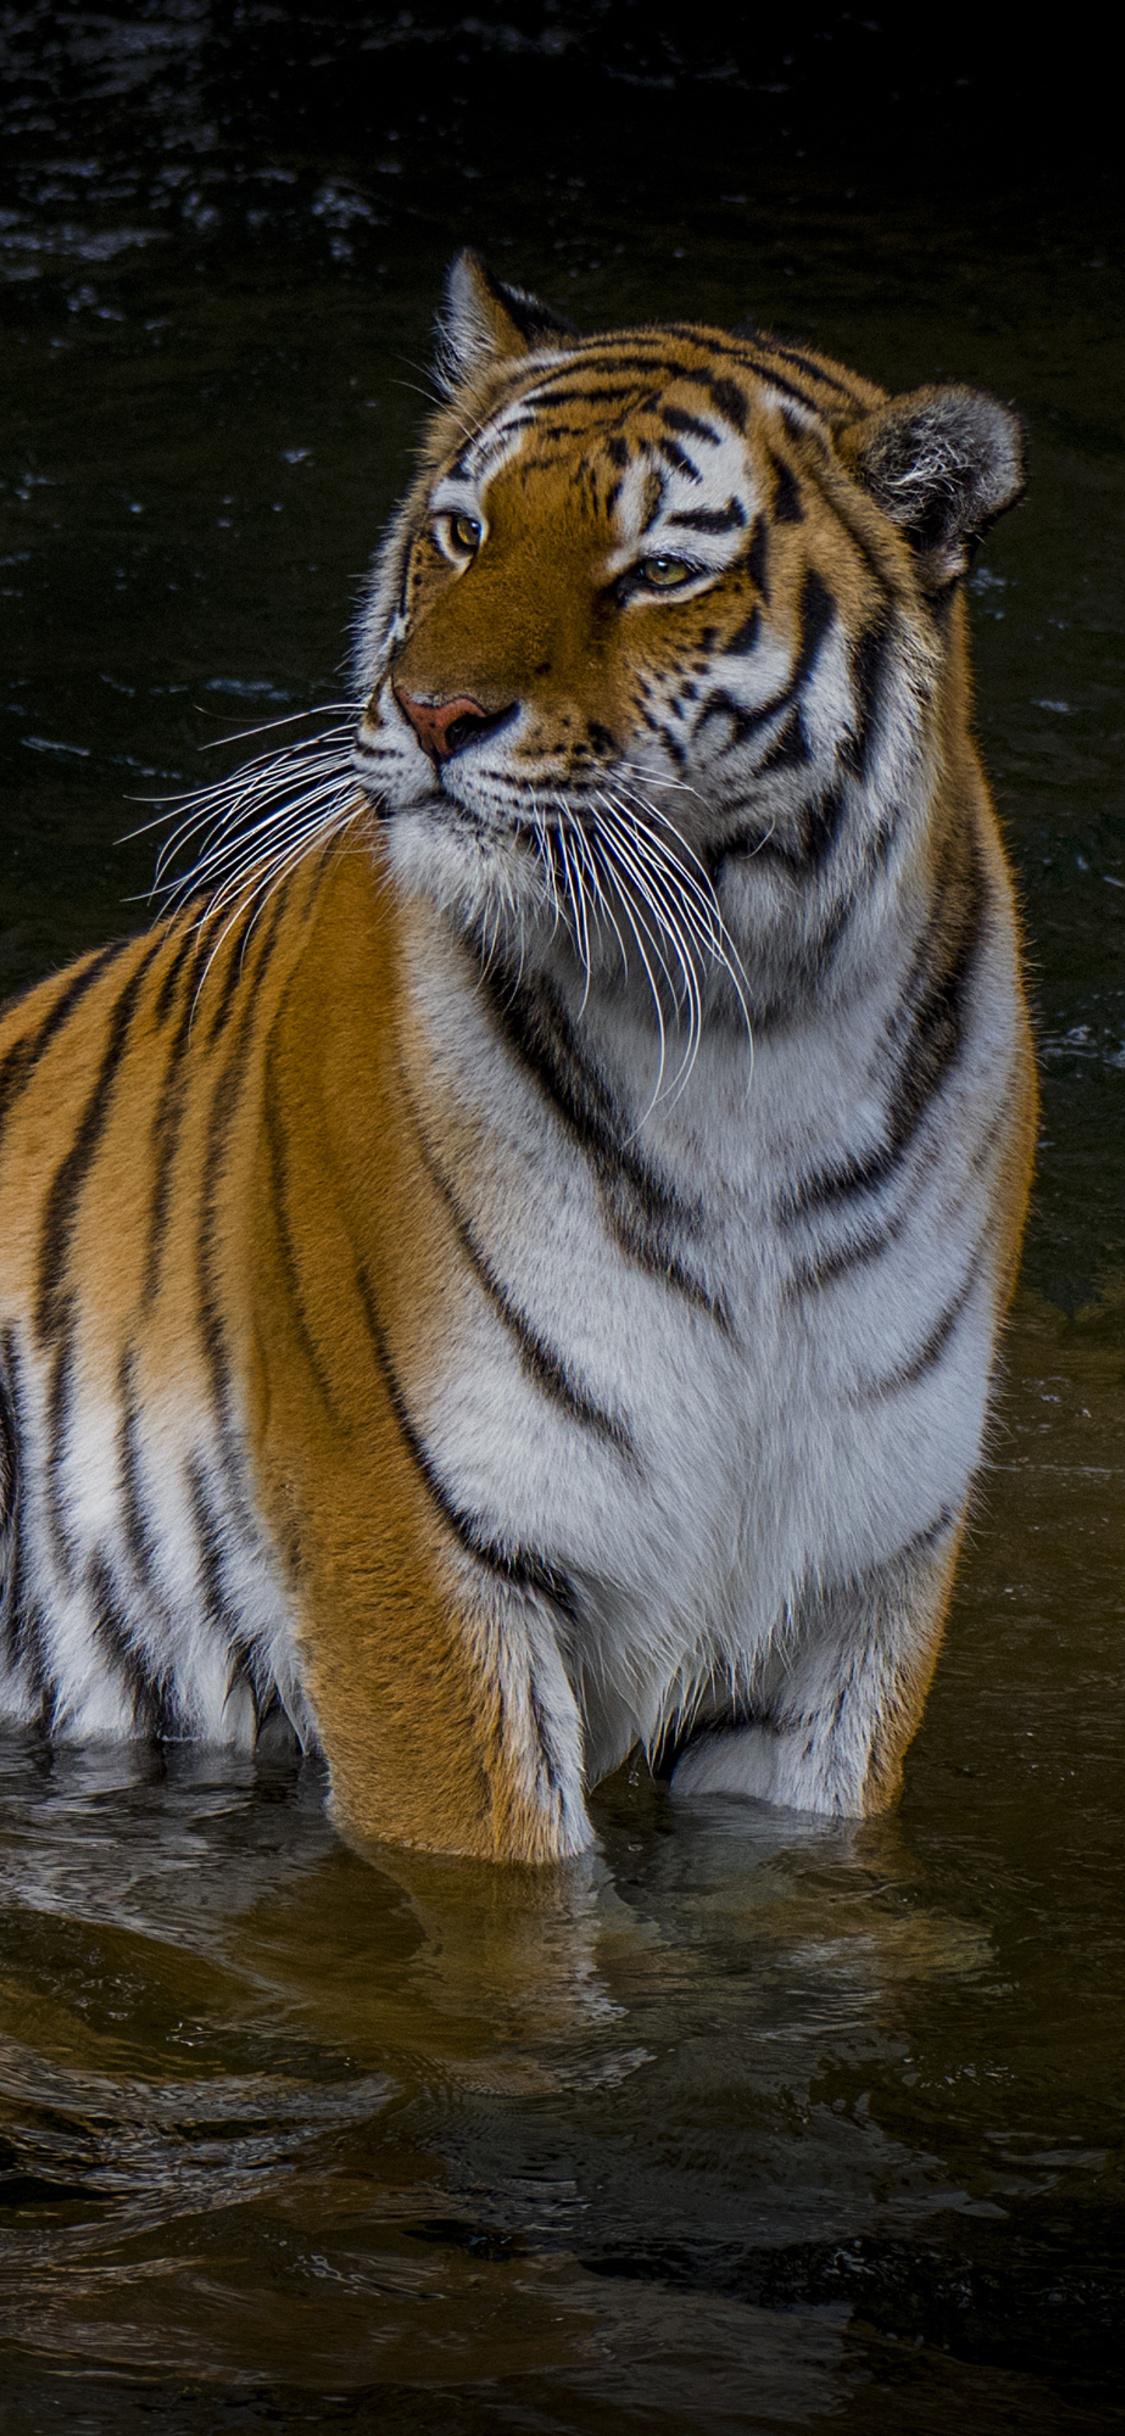 adult-tiger-4k-ub.jpg